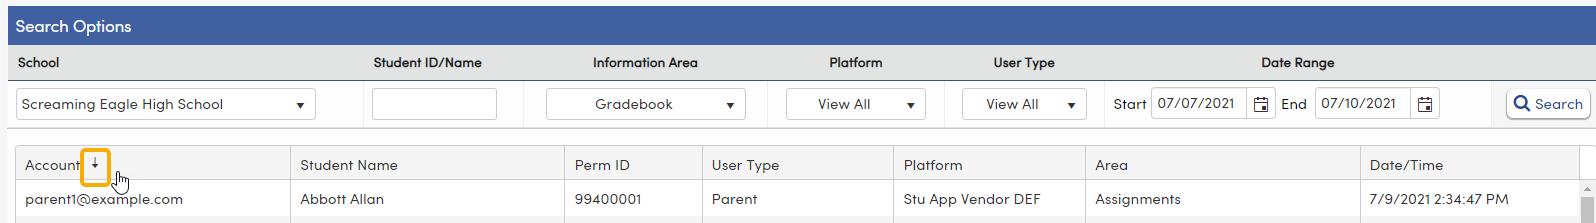 Portal Usage Log - Sort column